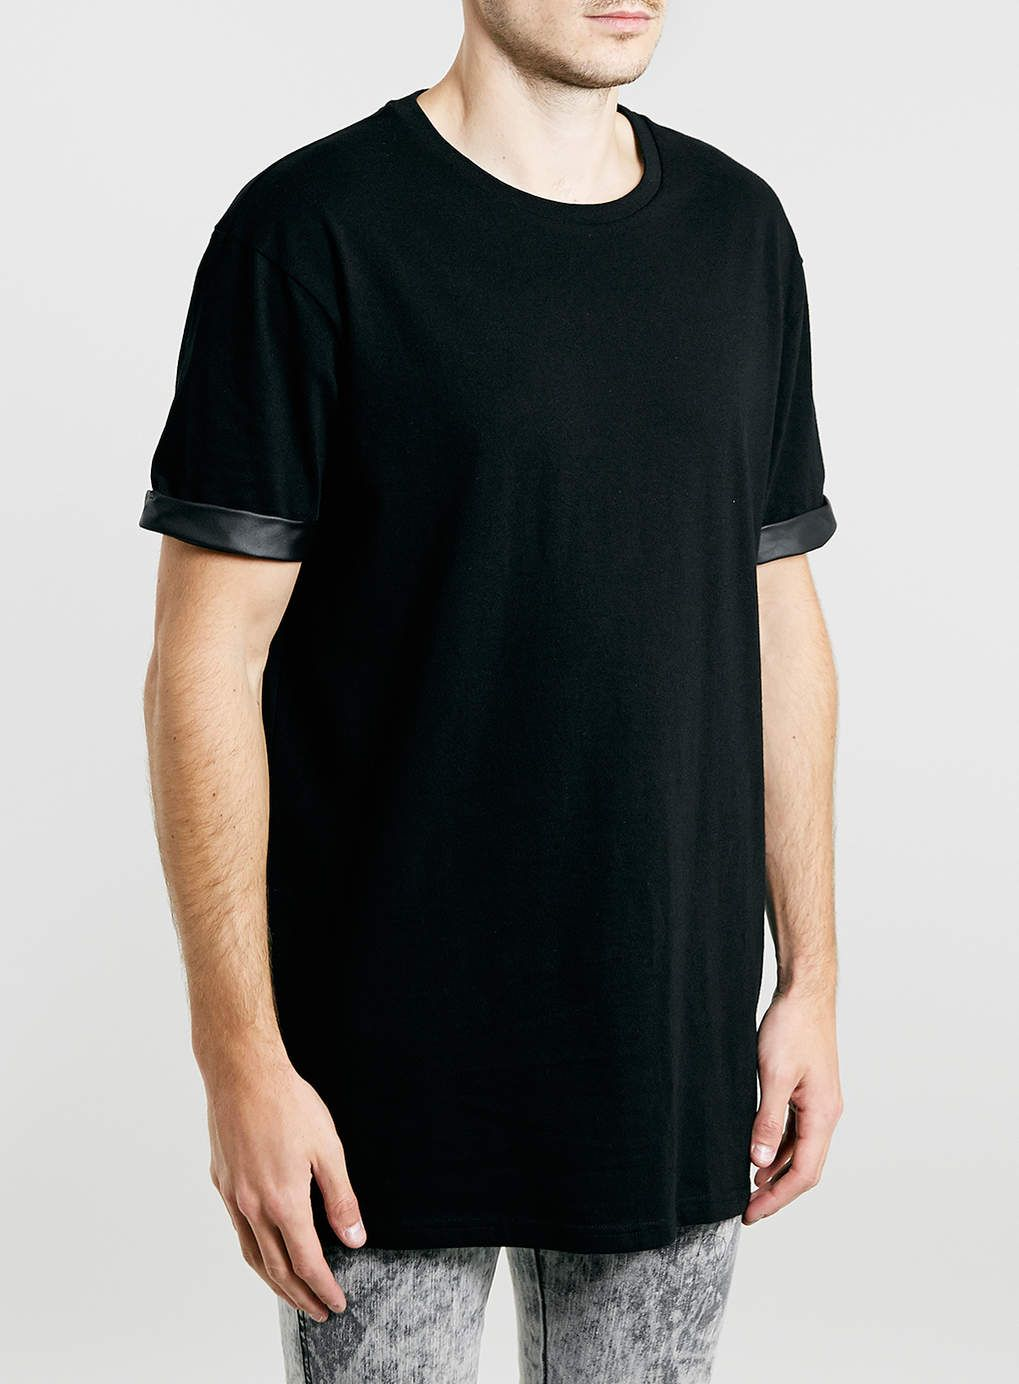 Black t shirt topman - Black Oversized Long Line Leather Look Roll T Shirt